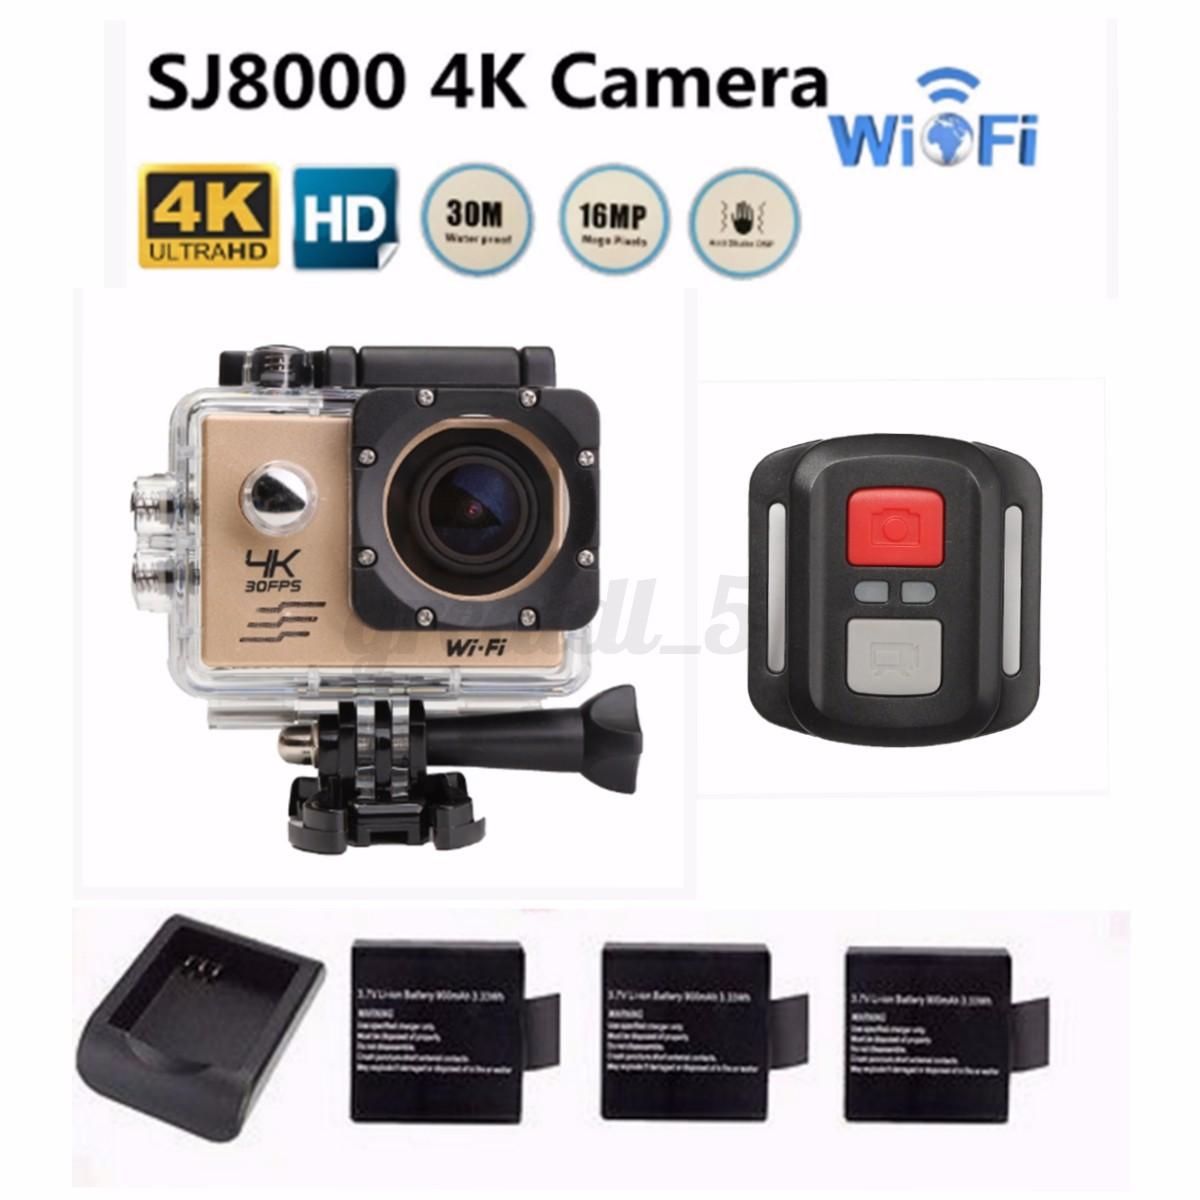 Action Sport Cam 4k Full Hd With Remote Random Daftar Update Harga Source Waterproof Sj8000 16mp Wifi Sports